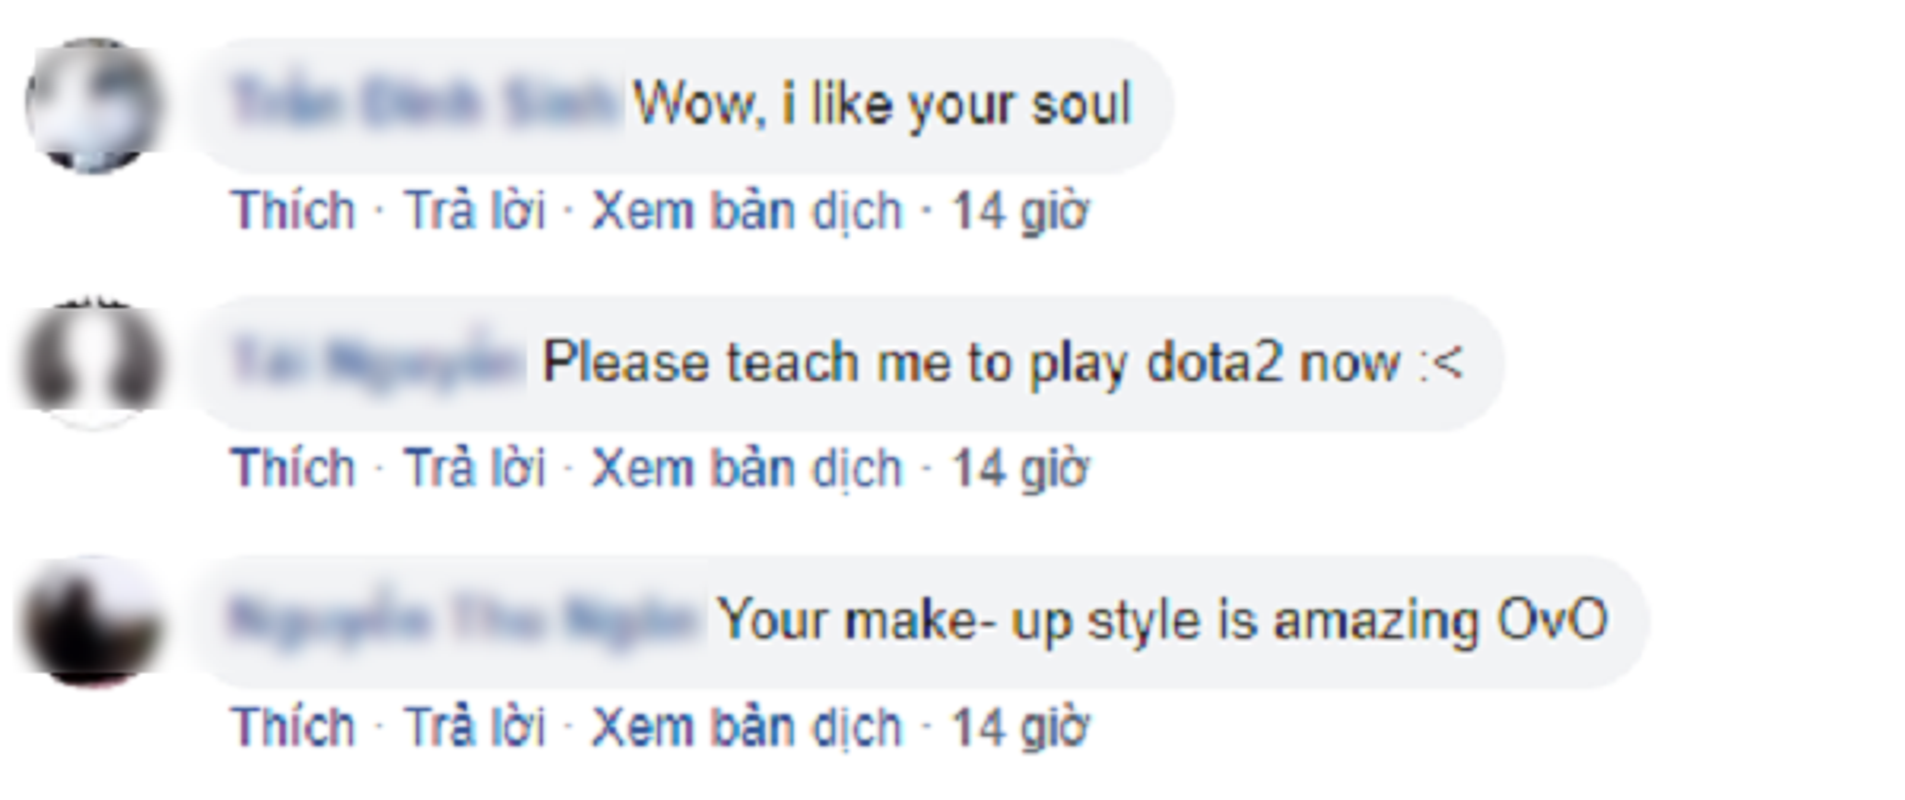 Gop vui hinh cosplay trong group game Viet, gai xinh Dan Mach